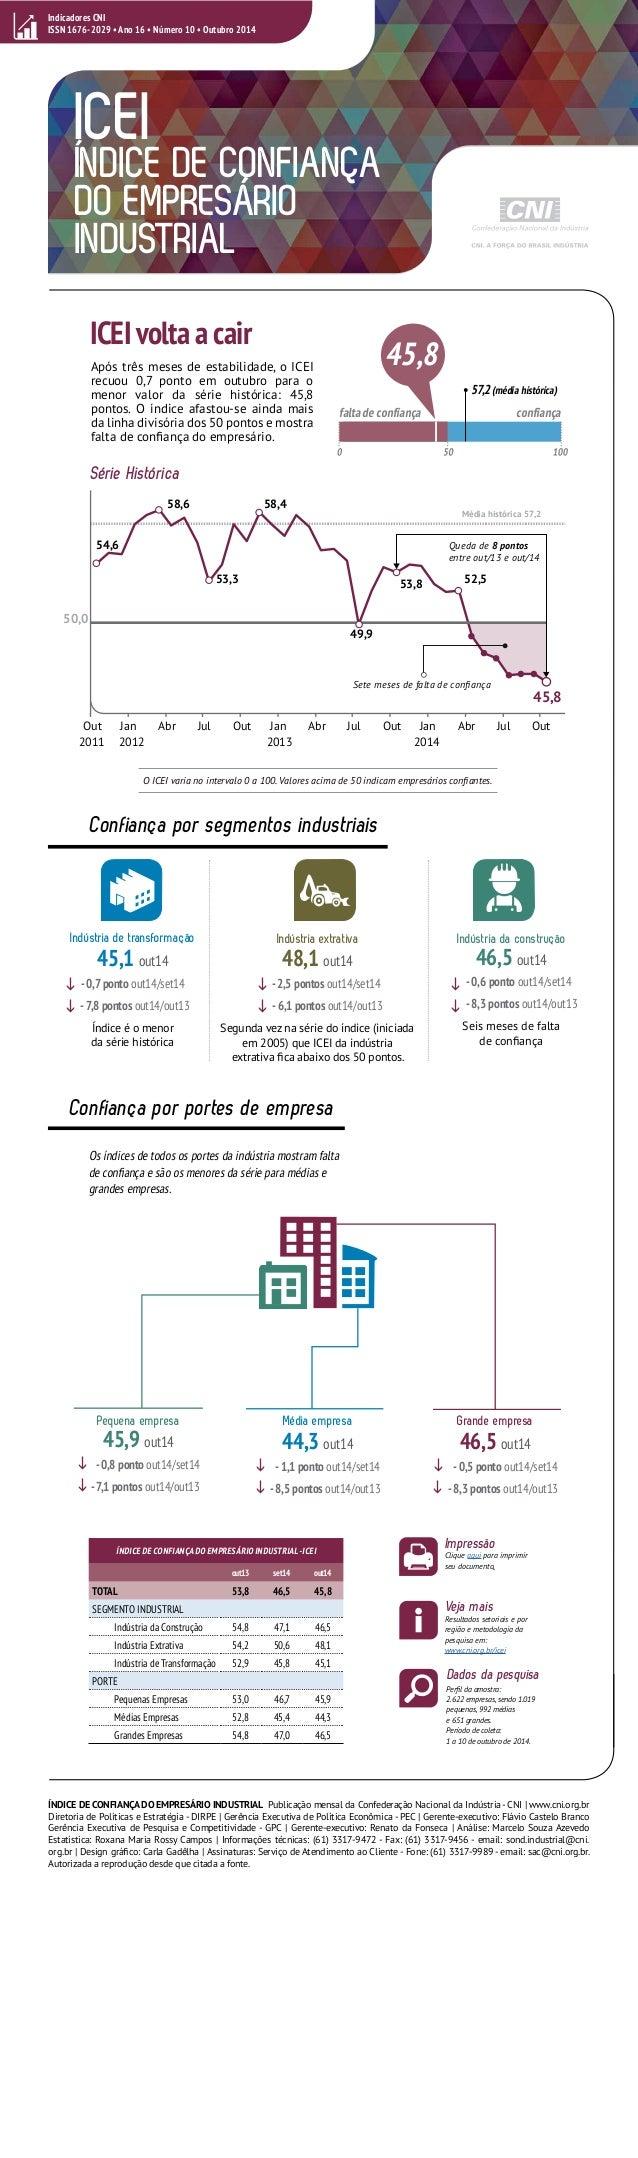 Indicadores CNI  ISSN 1676-2029 • Ano 16 • Número 10 • Outubro 2014  ICEI  ÍNDICE DE CONFIANÇA  DO EMPRESÁRIO  INDUSTRIAL ...